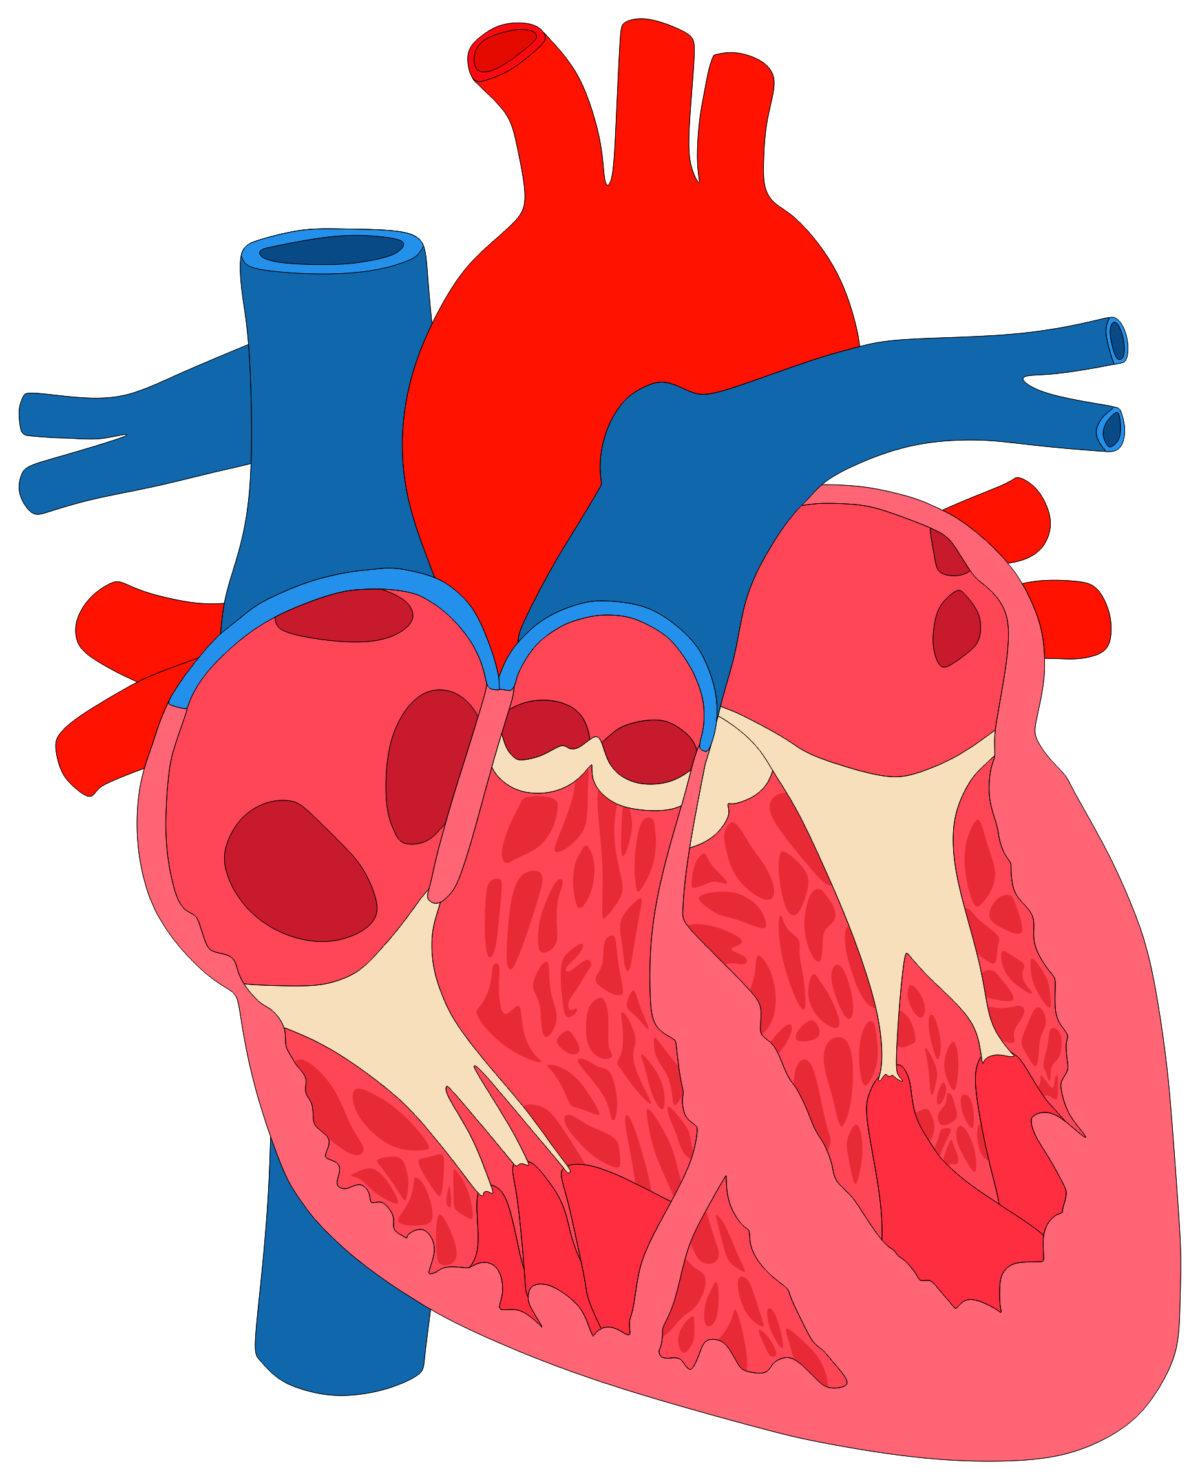 bigstock-Human-Heart-Muscle-Anatomy-cro-168919487-1200x1480.jpg